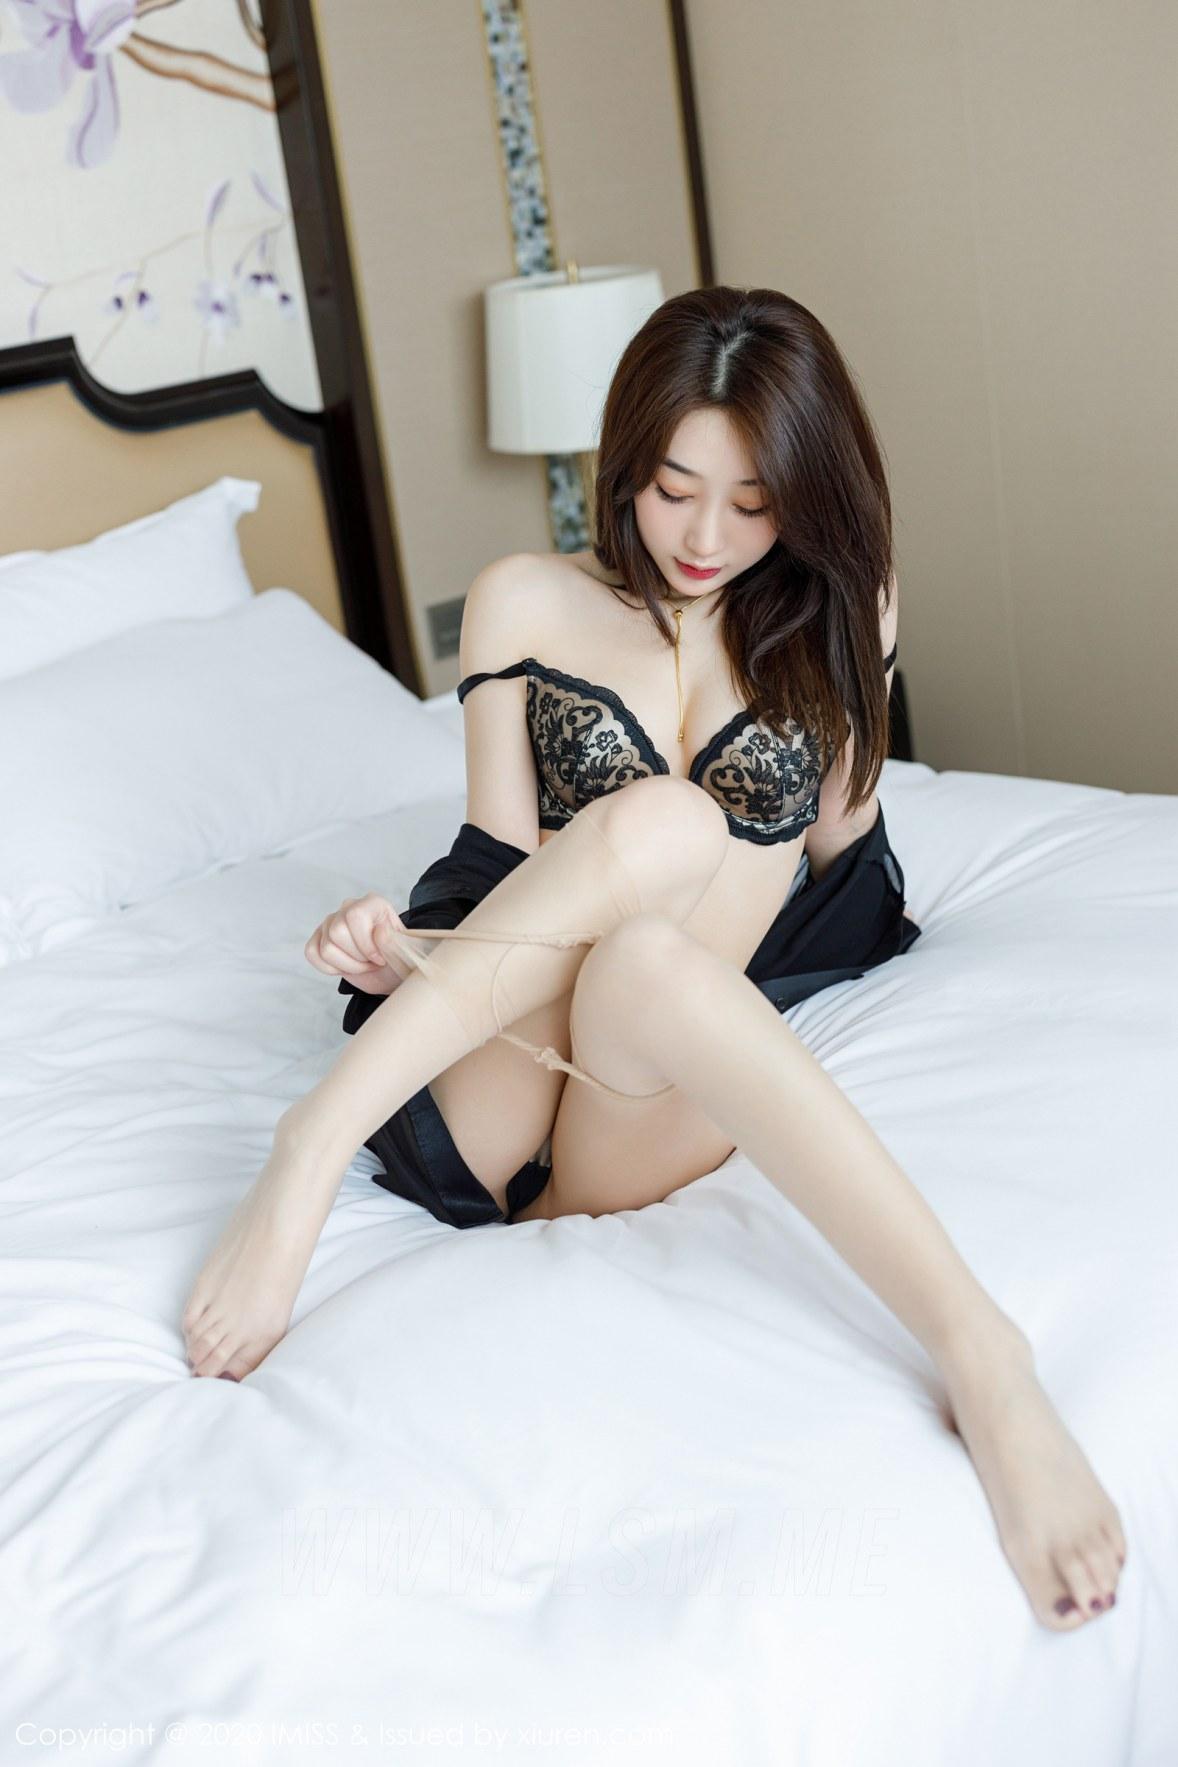 454 053 61u 3600 5400 - IMiss 爱蜜社 Vol.454 丝袜美腿写真 九月生__ - 爱蜜社 -【免费在线写真】【丽人丝语】